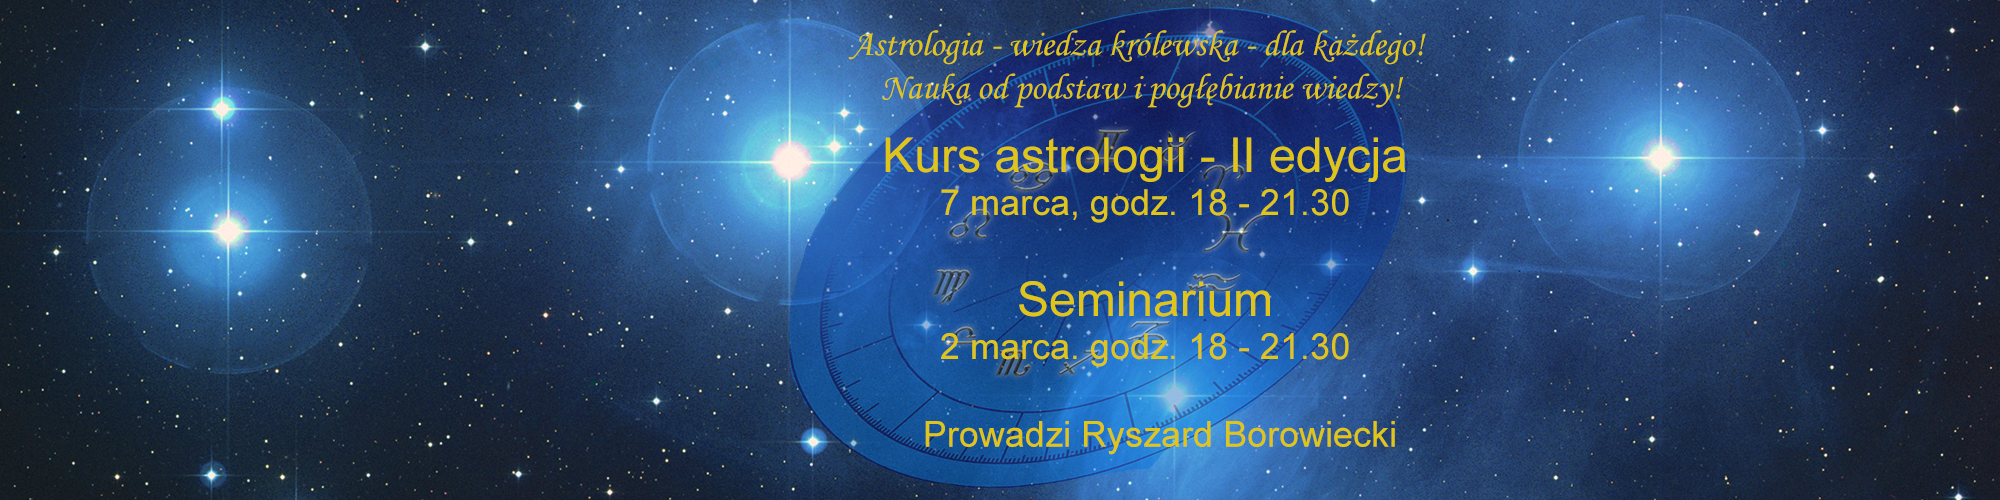 astrologia-banner